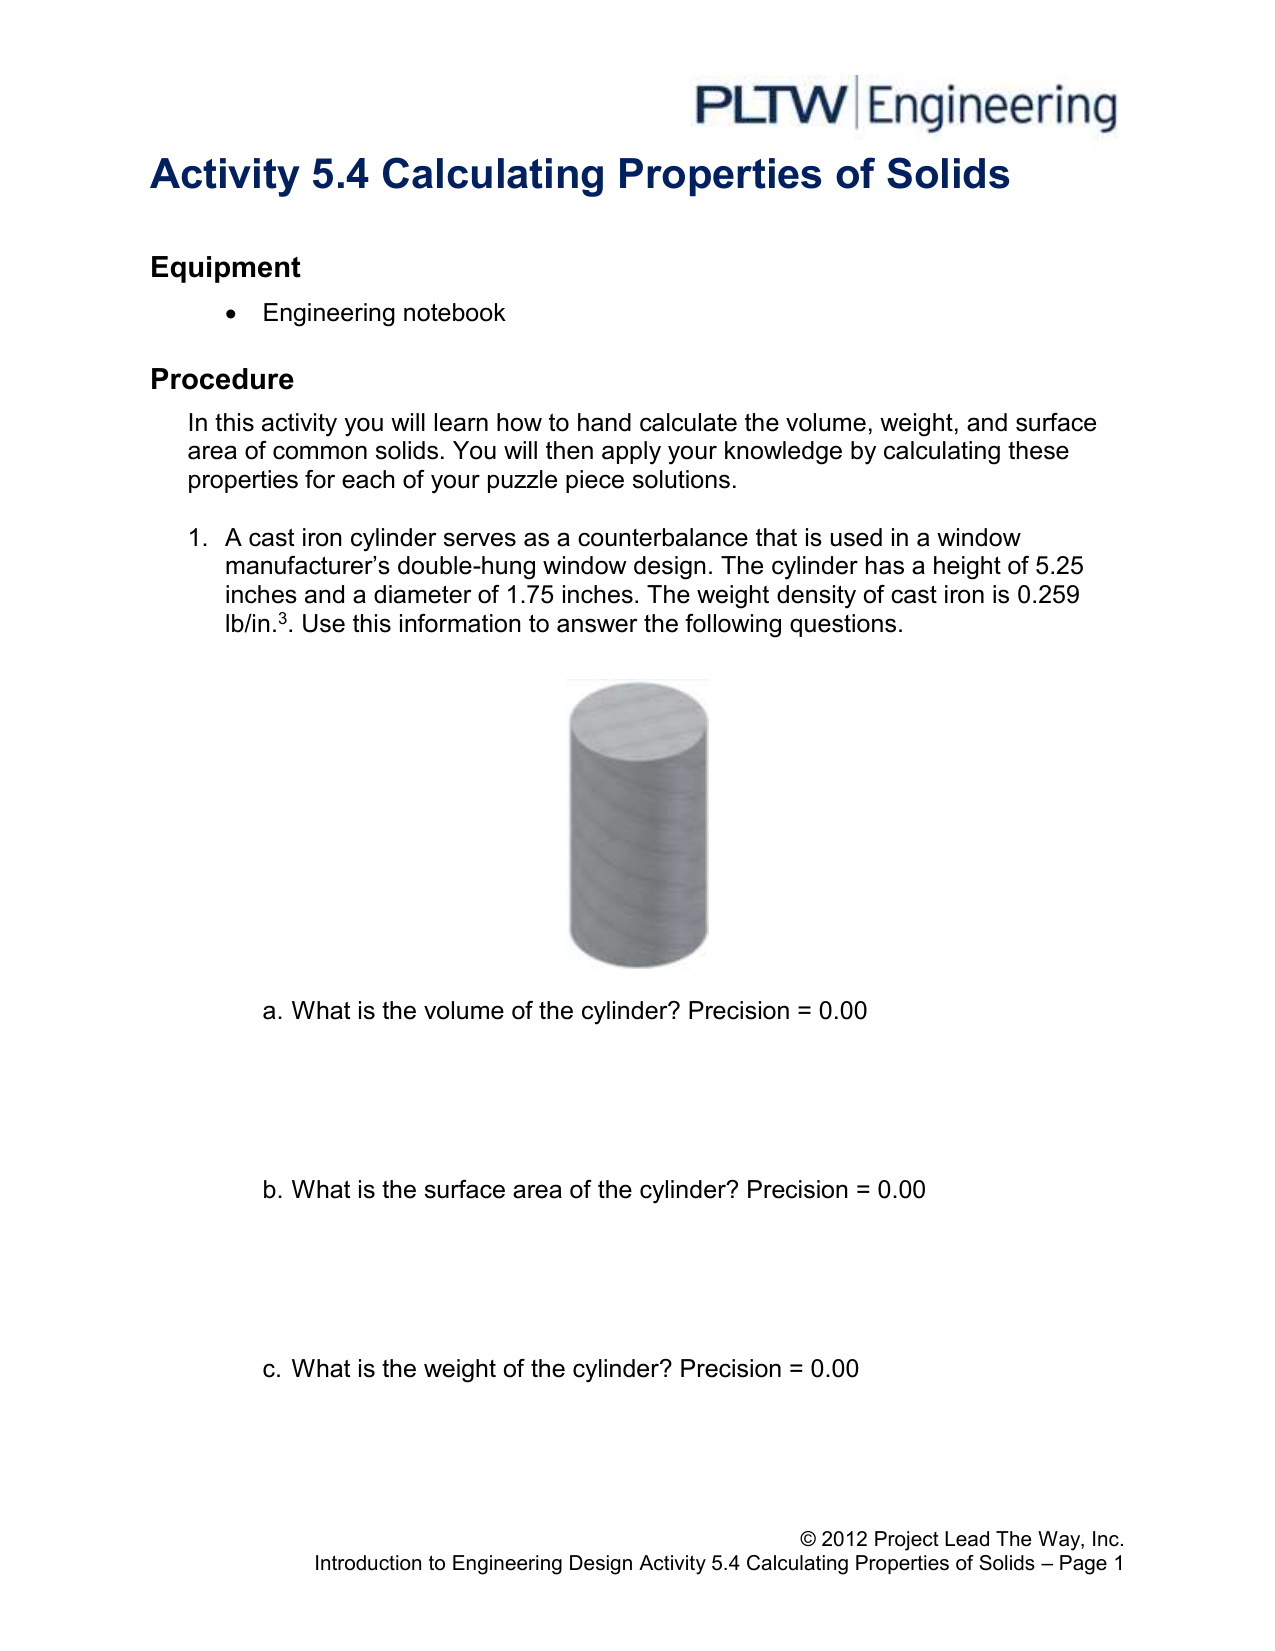 5 4 A Calculatingpropertiessolids